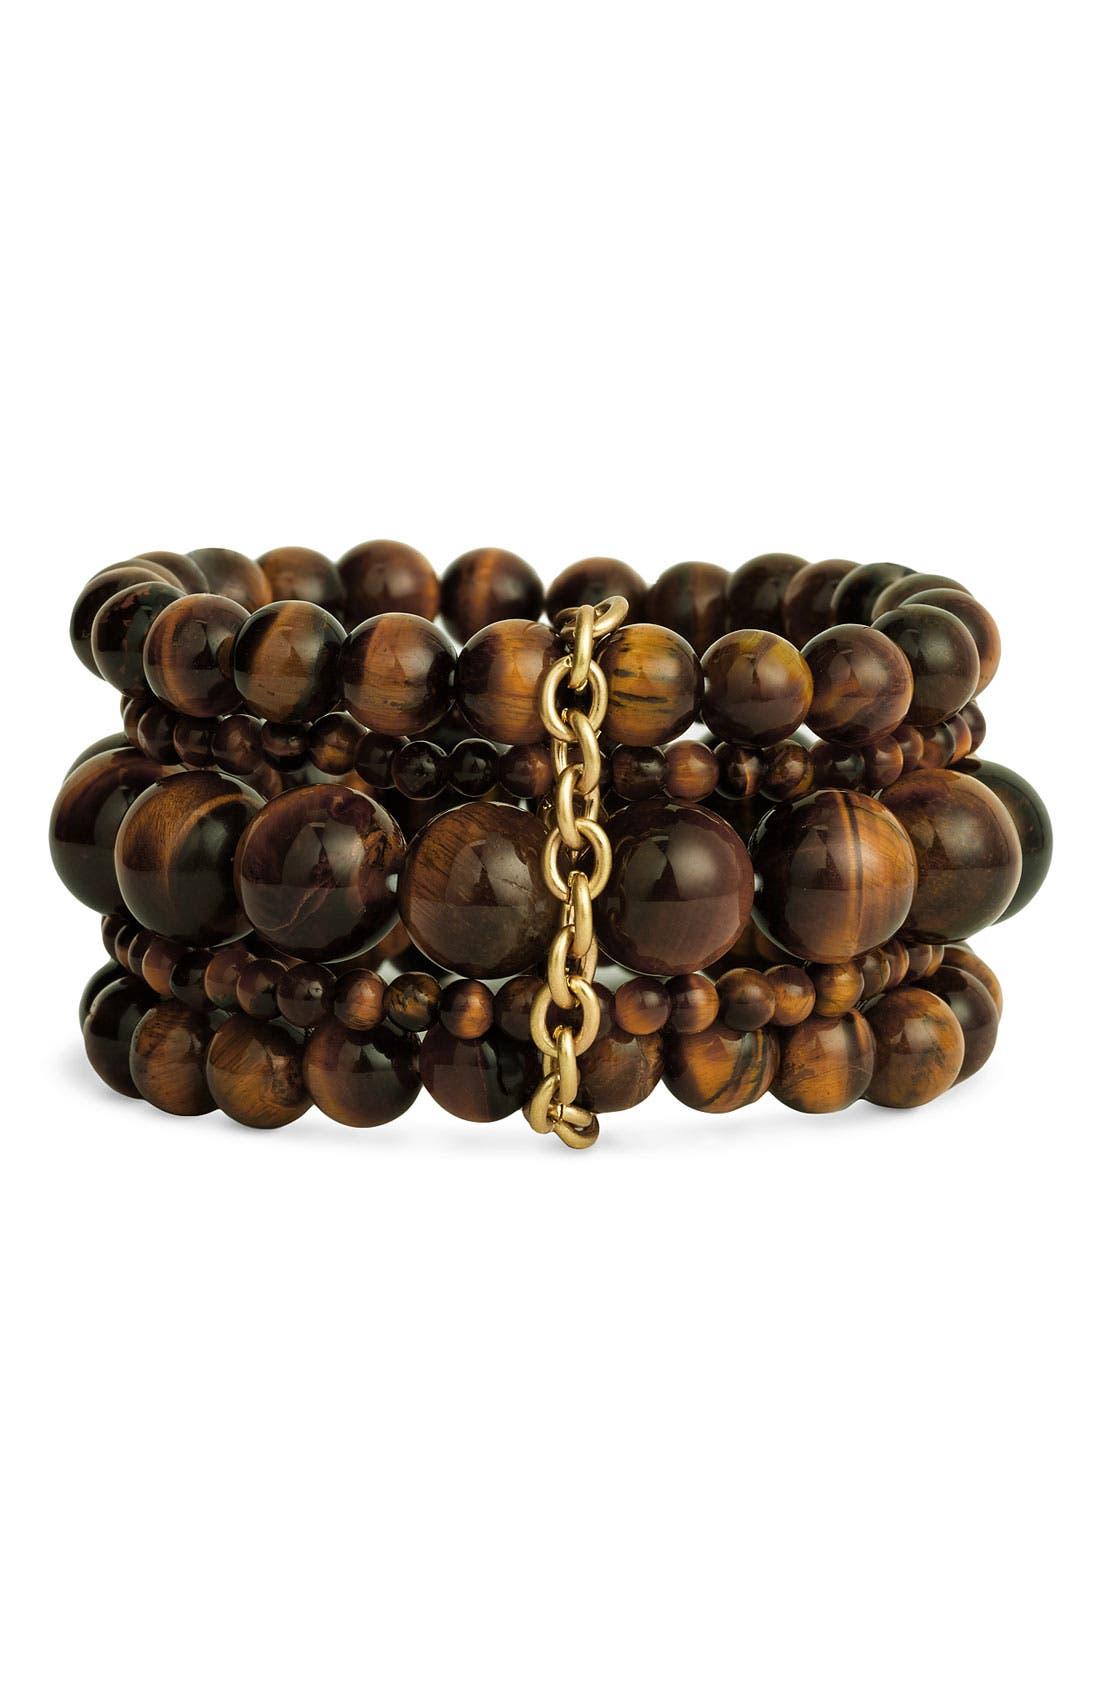 Alternate Image 1 Selected - Nordstrom Semiprecious Bead Stretch Bracelets (Set of 5)